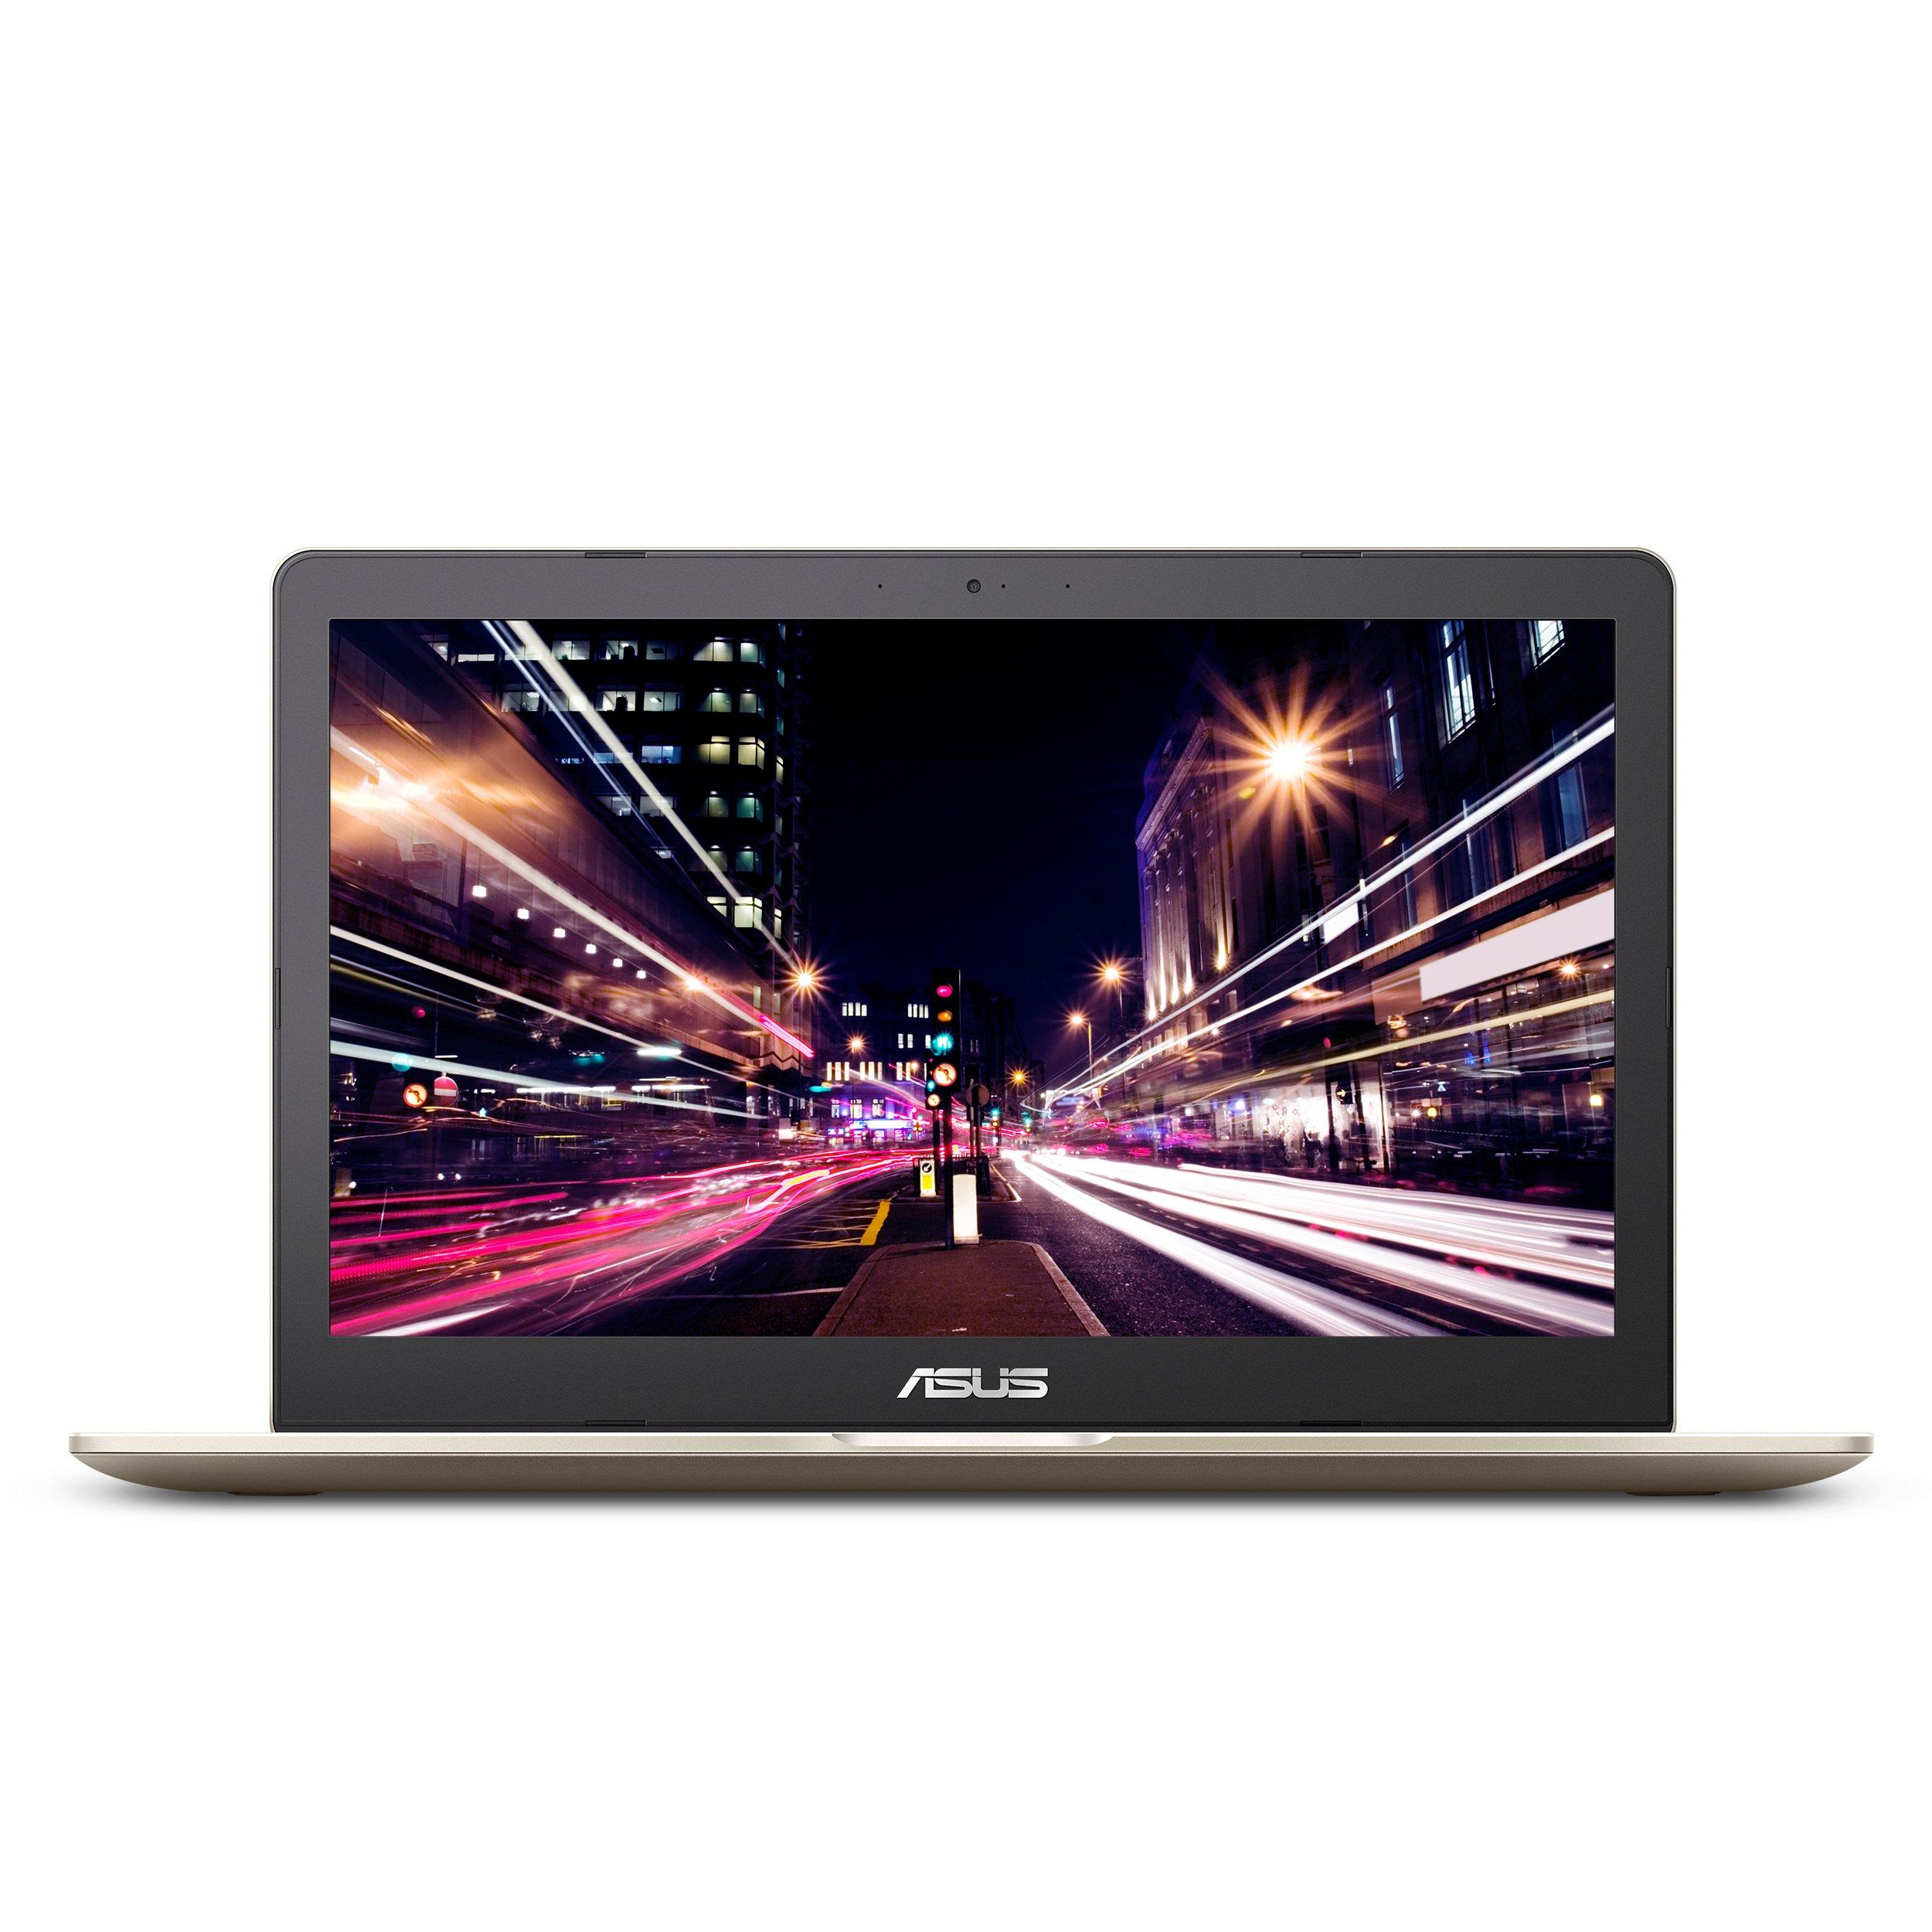 "ASUS M580VD-EB54 VivoBook 15.6"" FHD thin and light Gaming Laptop (Intel Core i5-7300HQ, GTX 1050 2GB, 8GB DDR4, 256GB SSD), backlit keyboard"